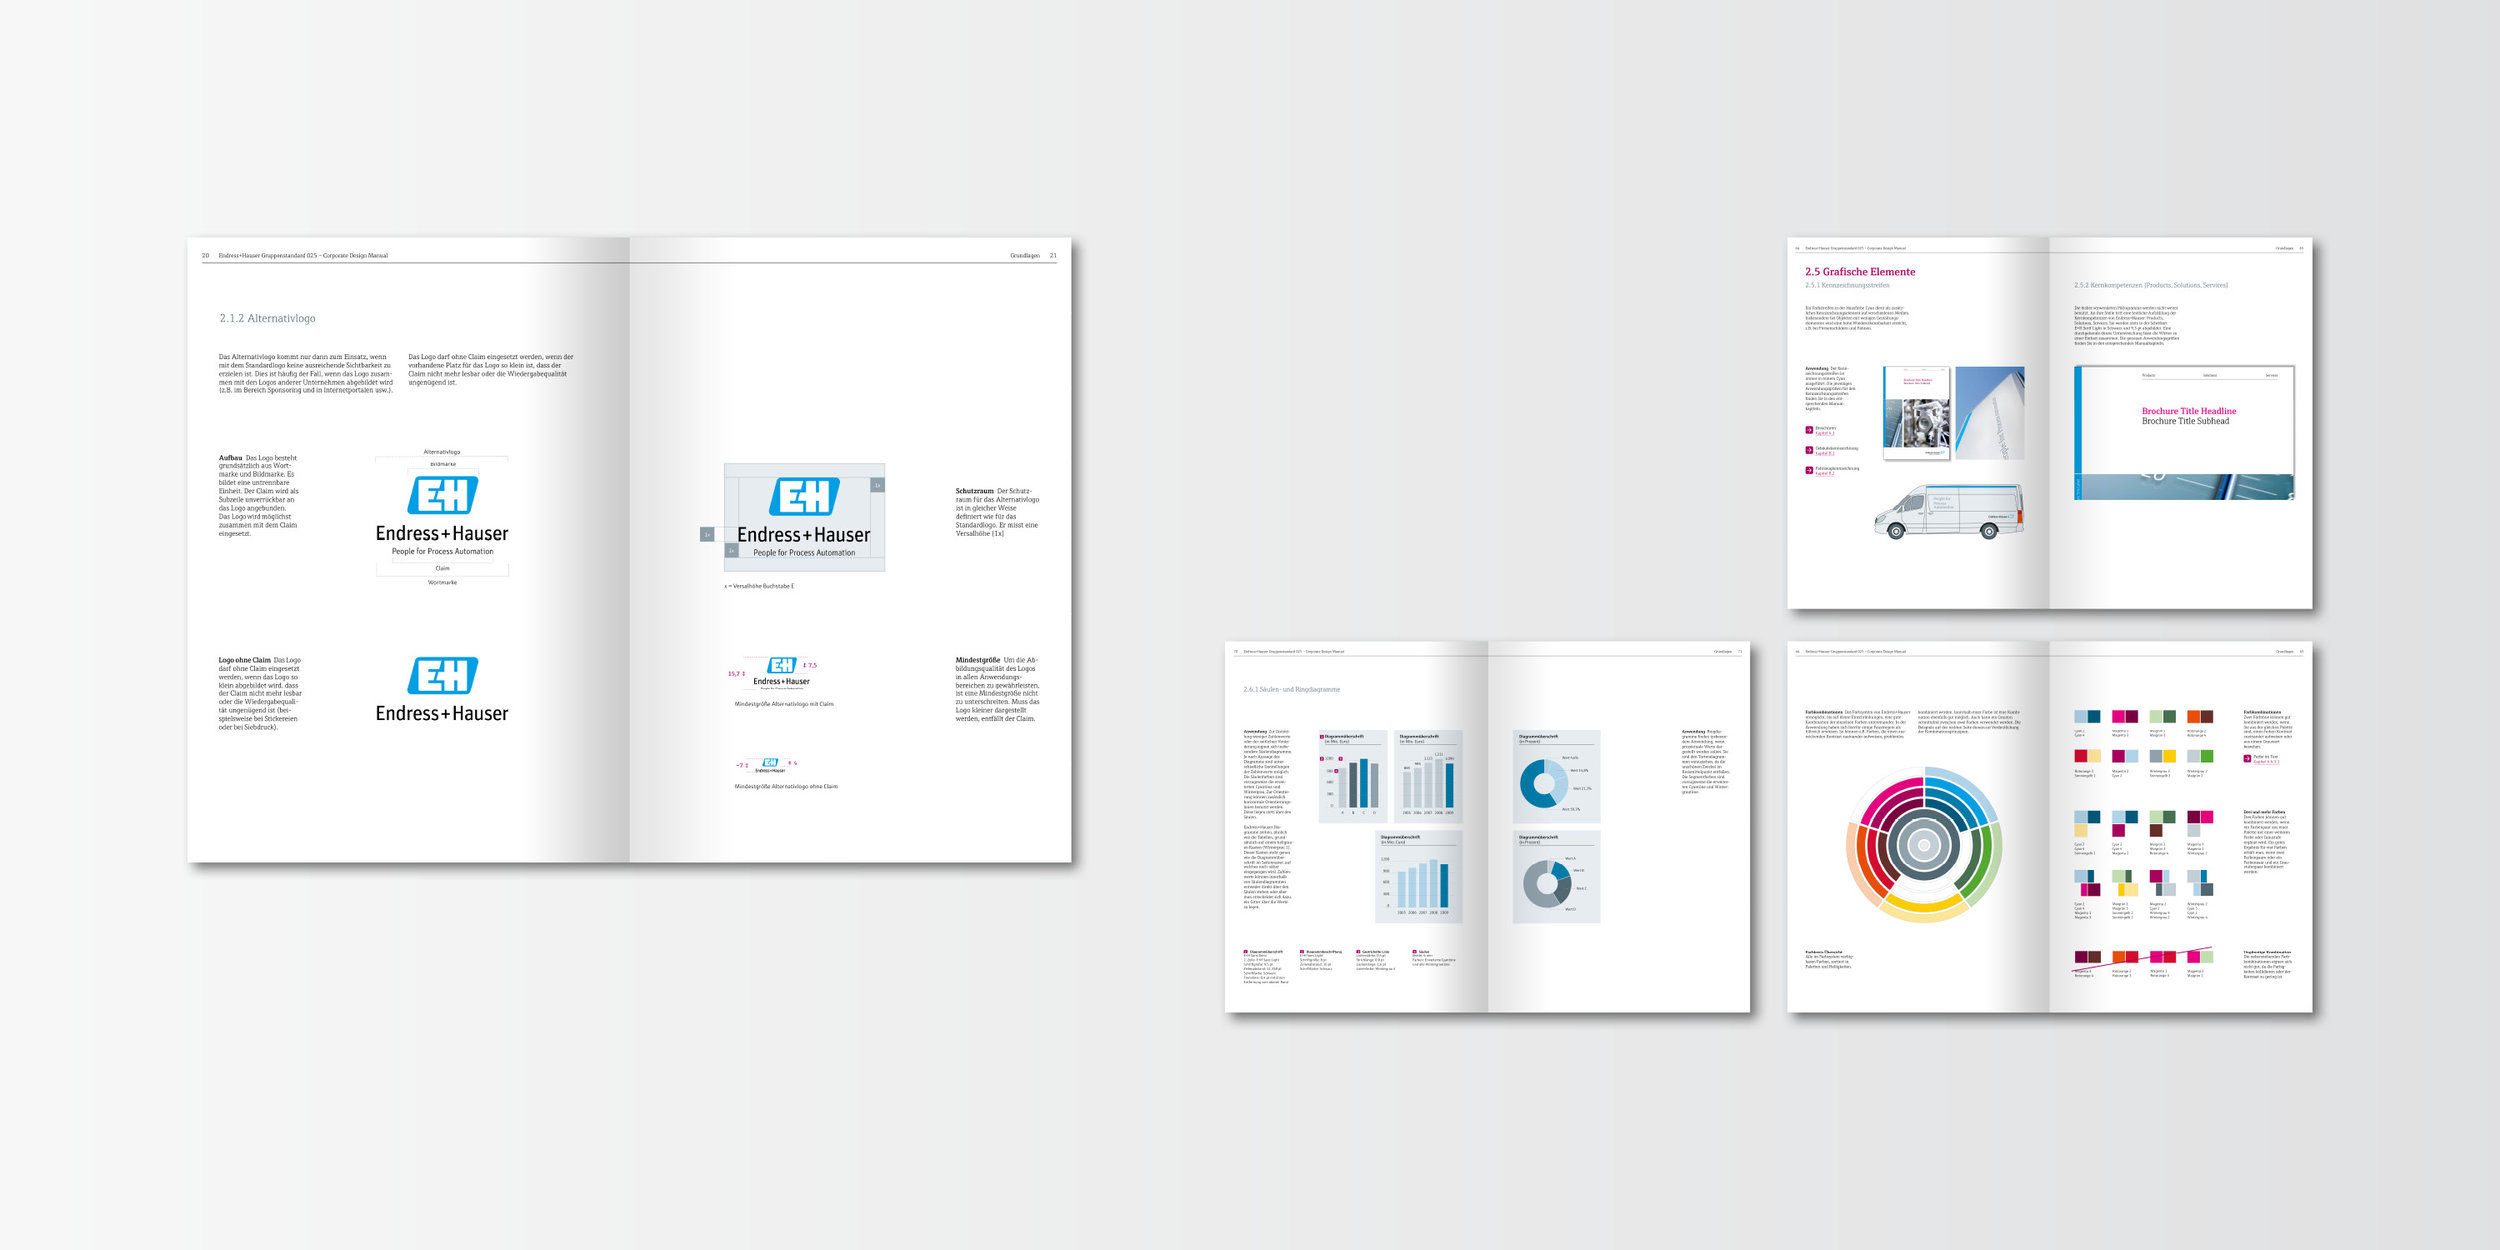 Endress+Hauser Corporate Design 03.jpg